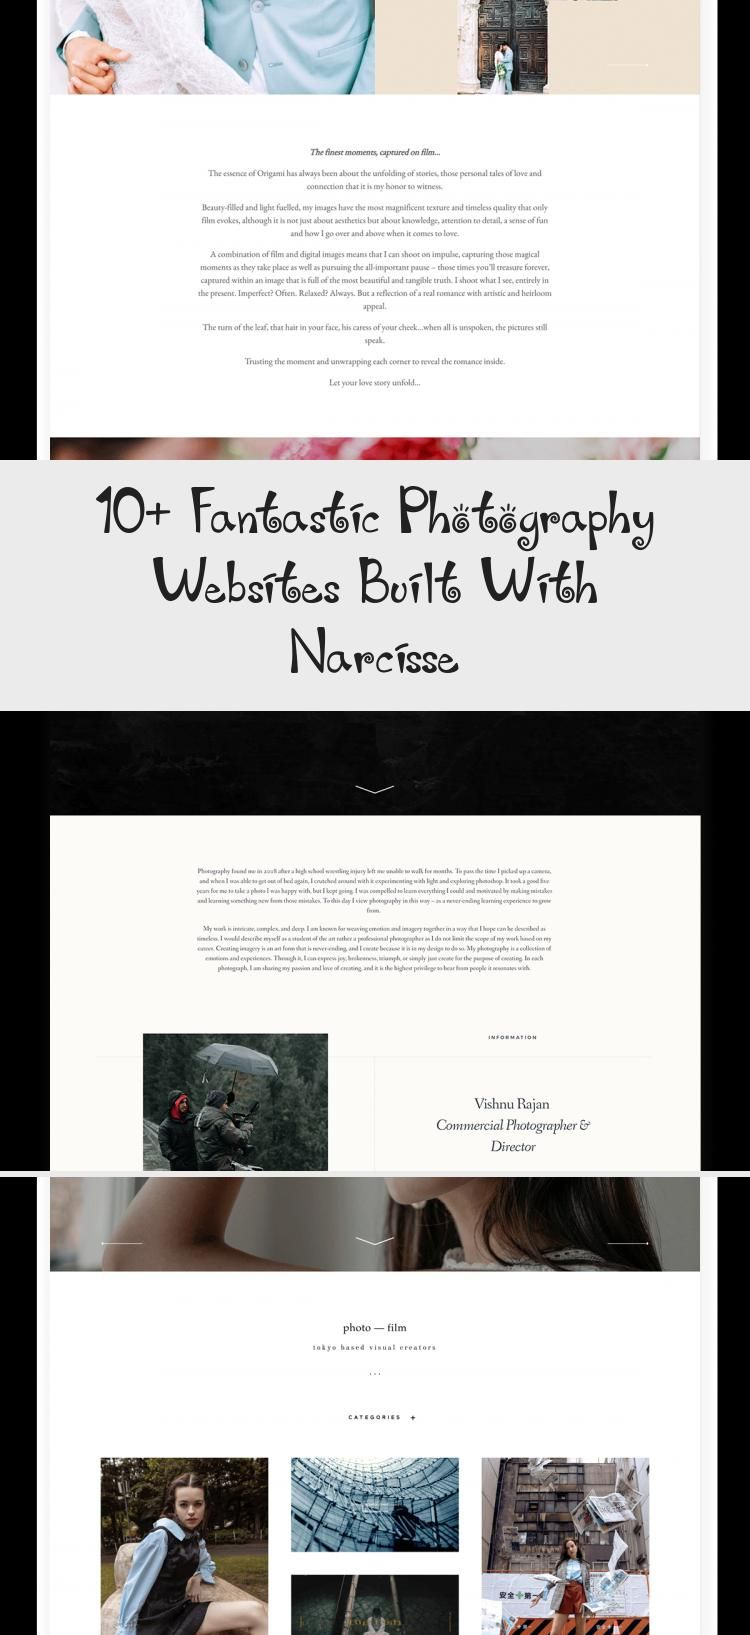 10 Fantastic Photography Websites Built With Narcisse In 2020 Photography Website Web Design School Web Design